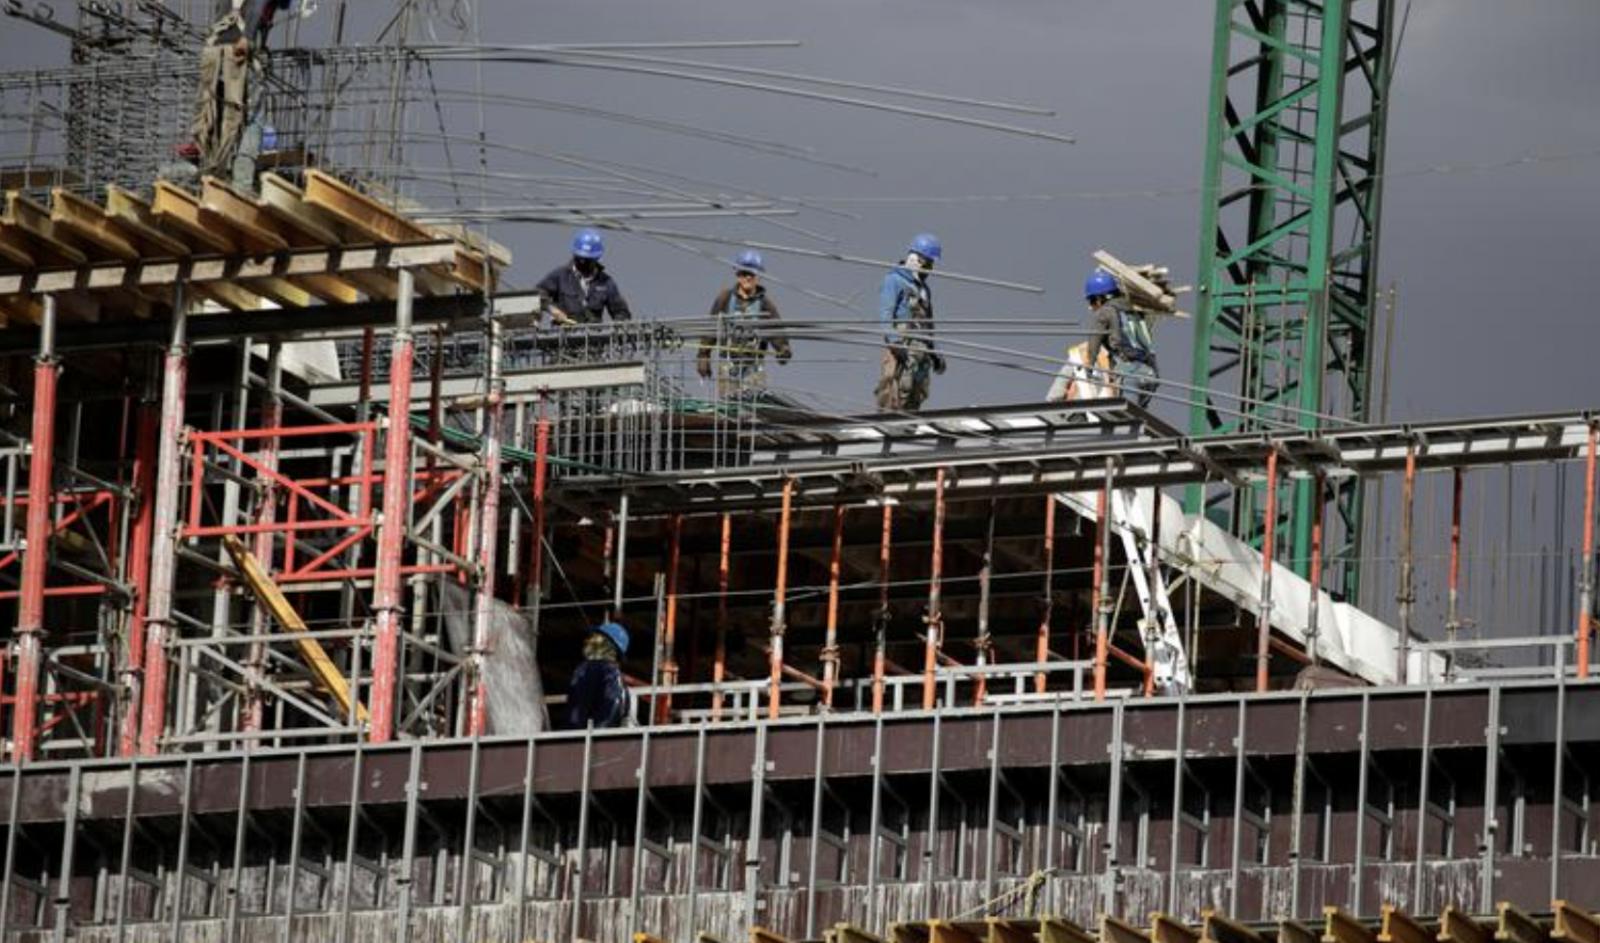 Mexico's Economy in 2020 Suffers Worst Slump Since 1930s